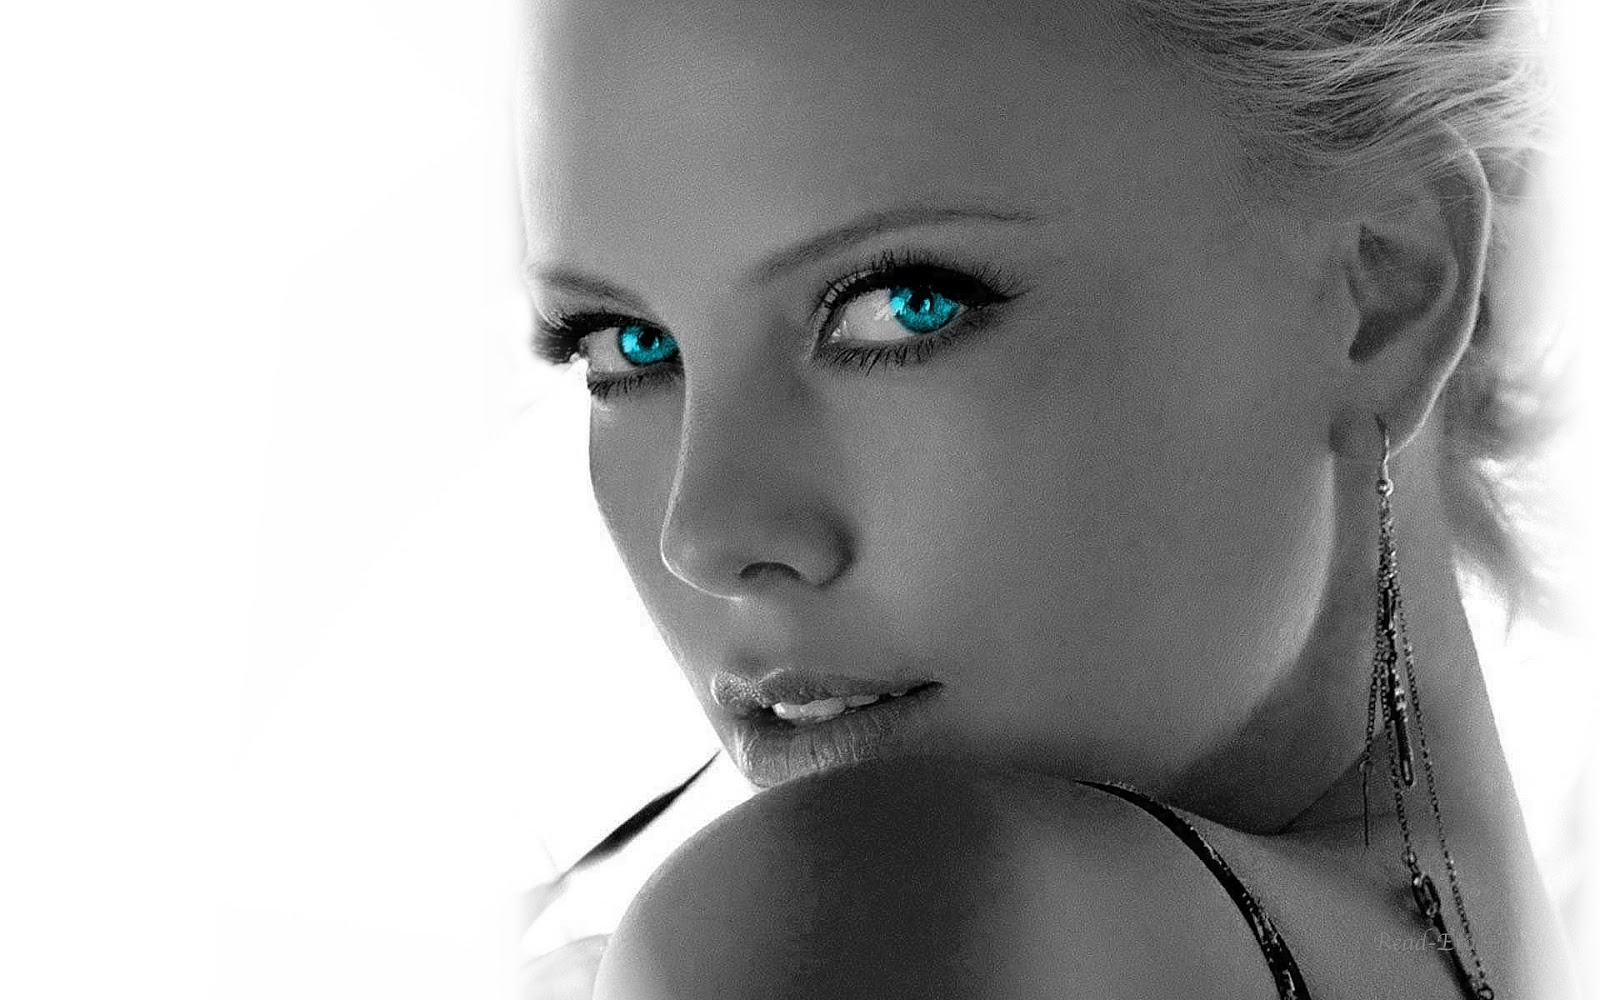 Beautiful Girls Blue Eyes Hd Wallpapers 2013 Latest Hd Wallpapers 1600x1000